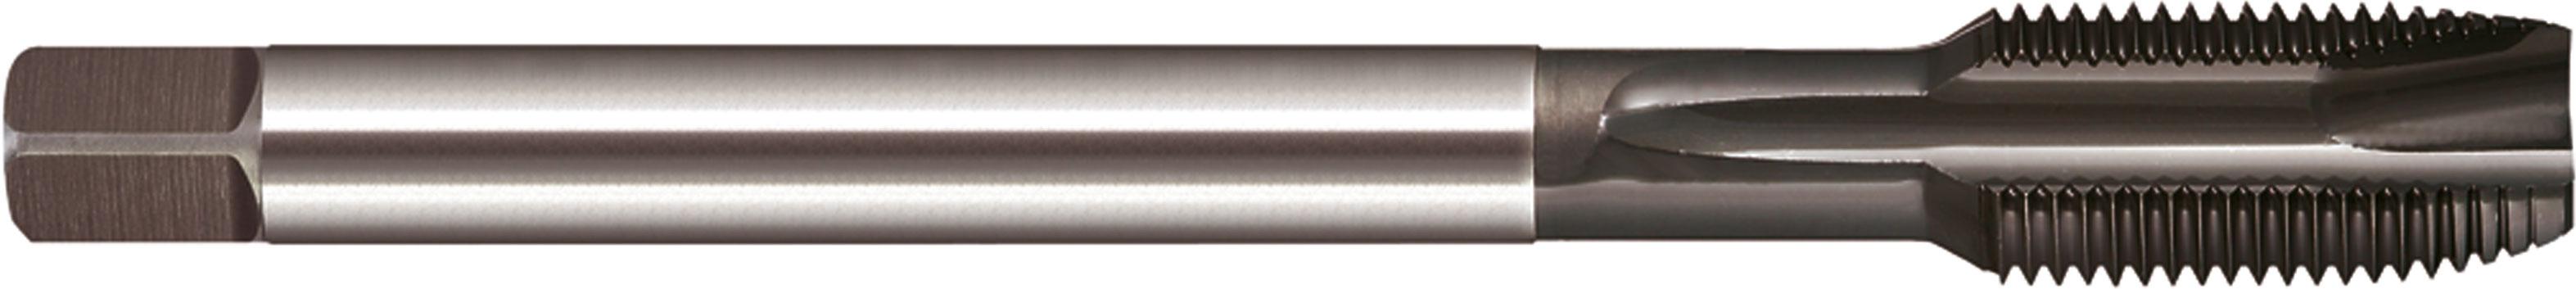 Projahn Forets Set 10tlg HSS-G DIN 340 Longue Ø 1-10 mm 60831 acier alu bois